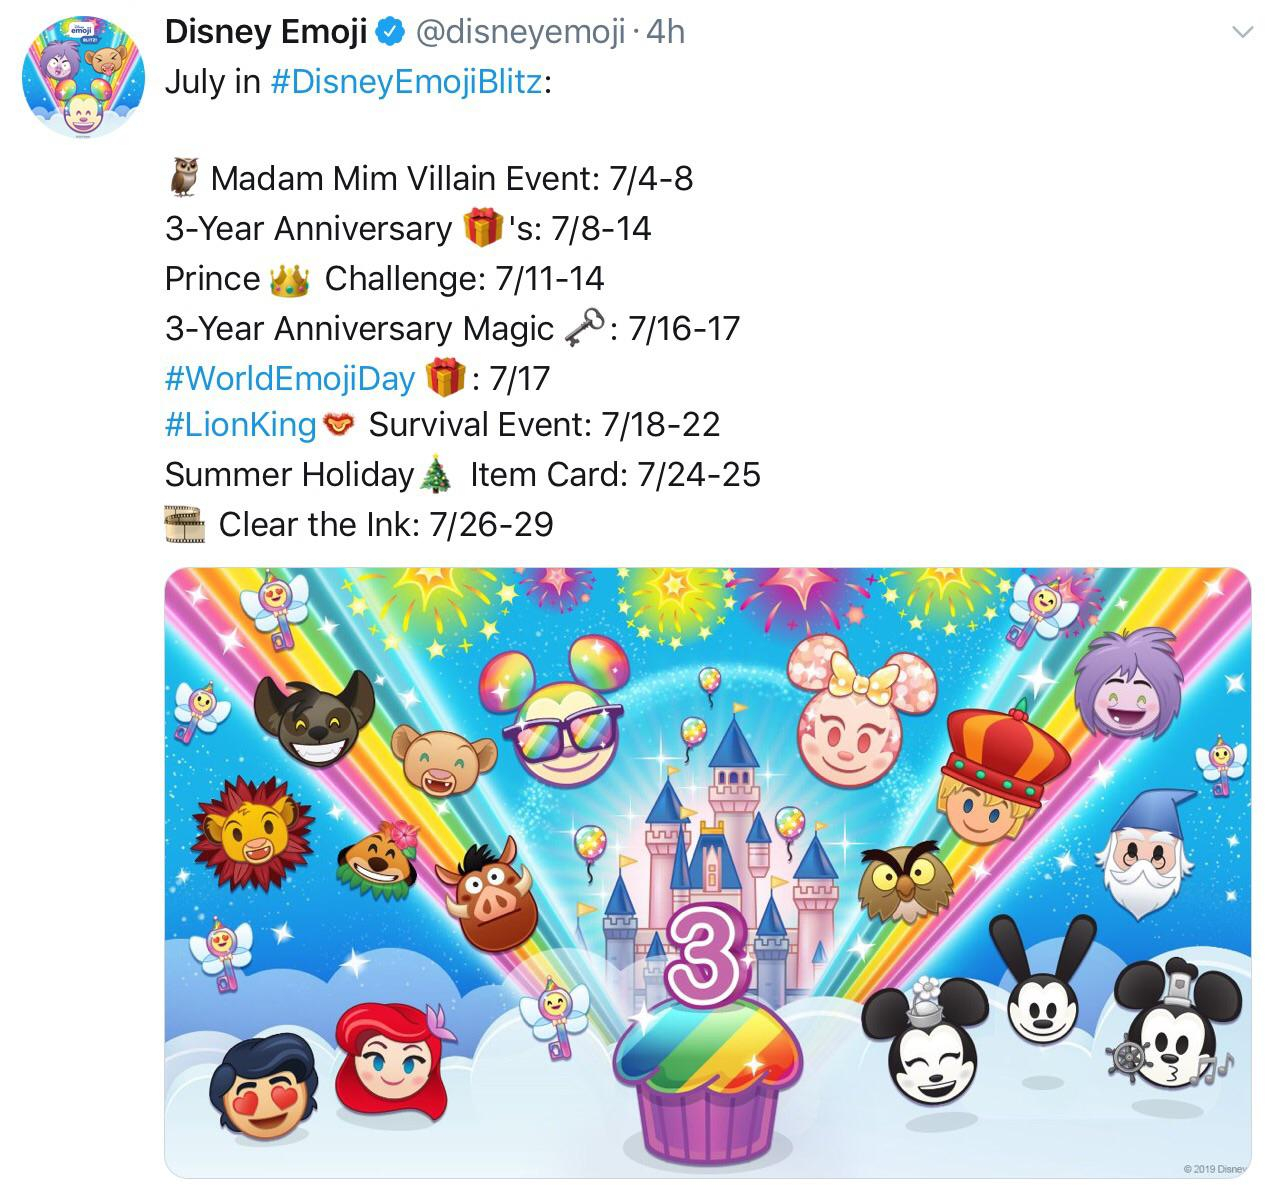 This Months Calendar : Disneyemojiblitz in Disney Emoji Blitz Events Calendar